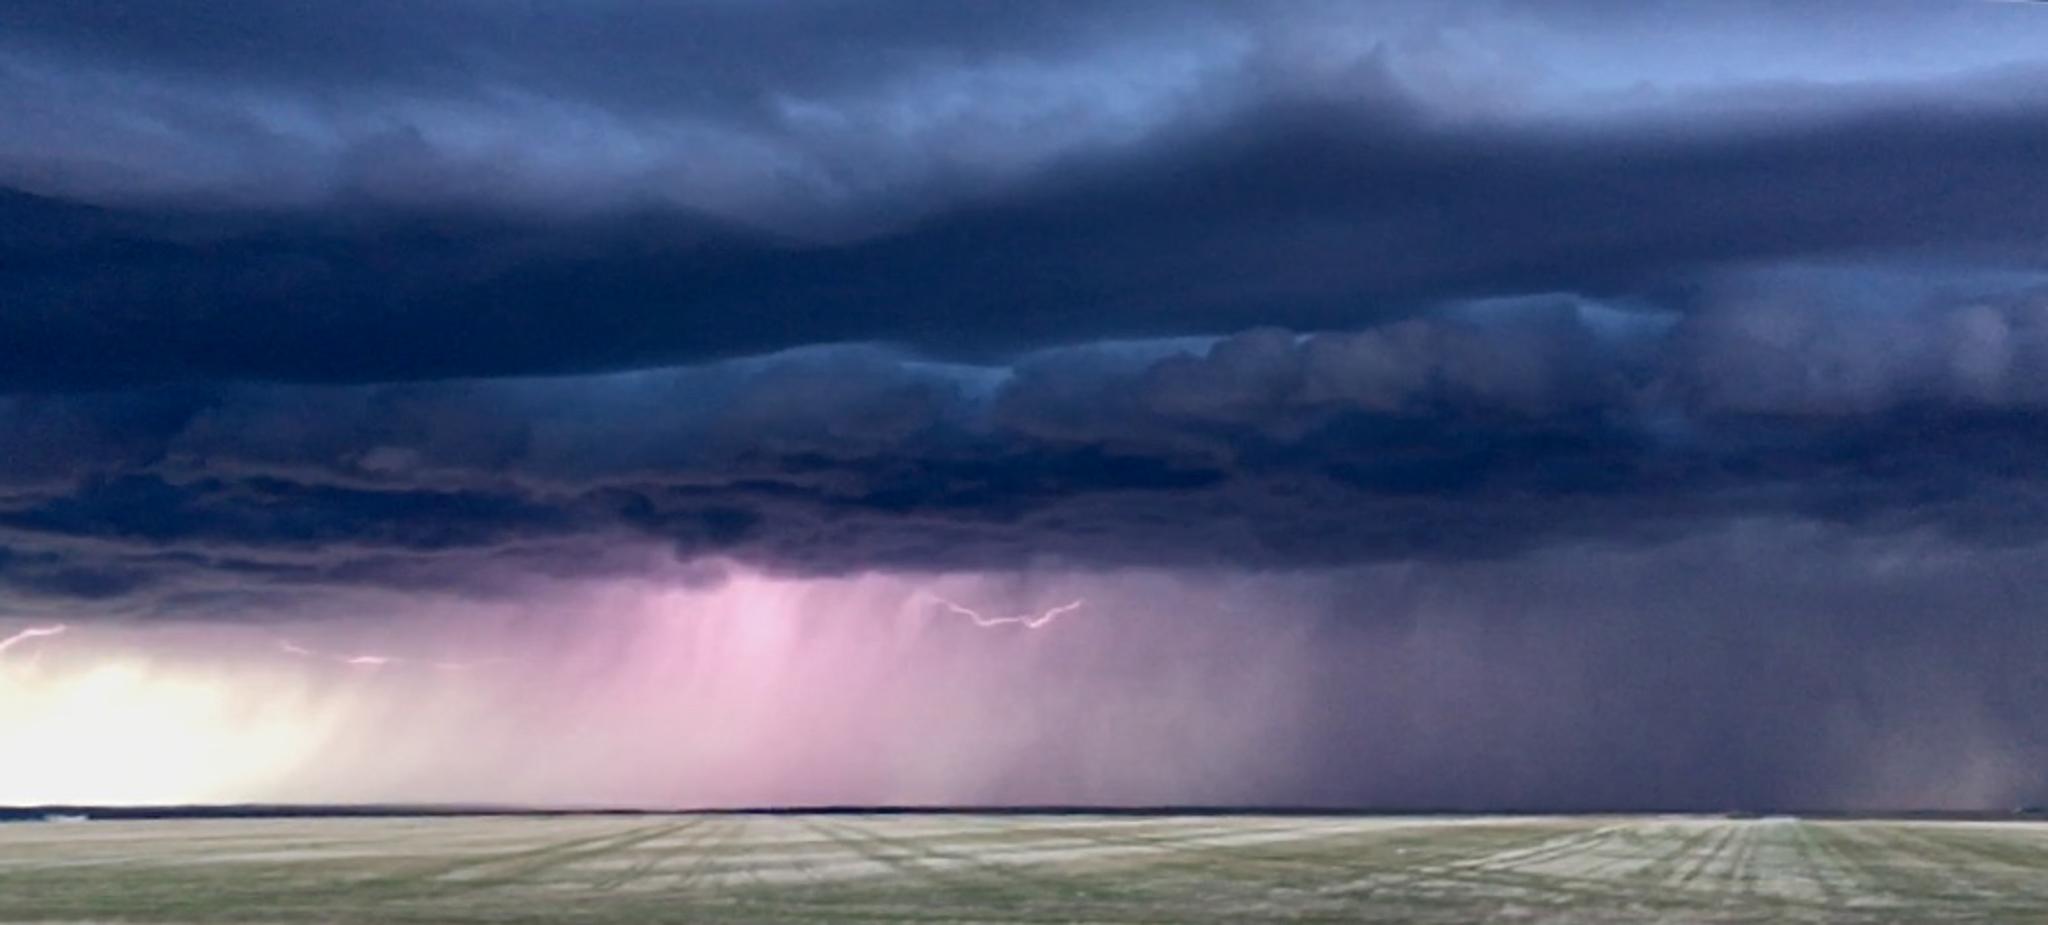 The Passing Storm - Kevin Haggkvist